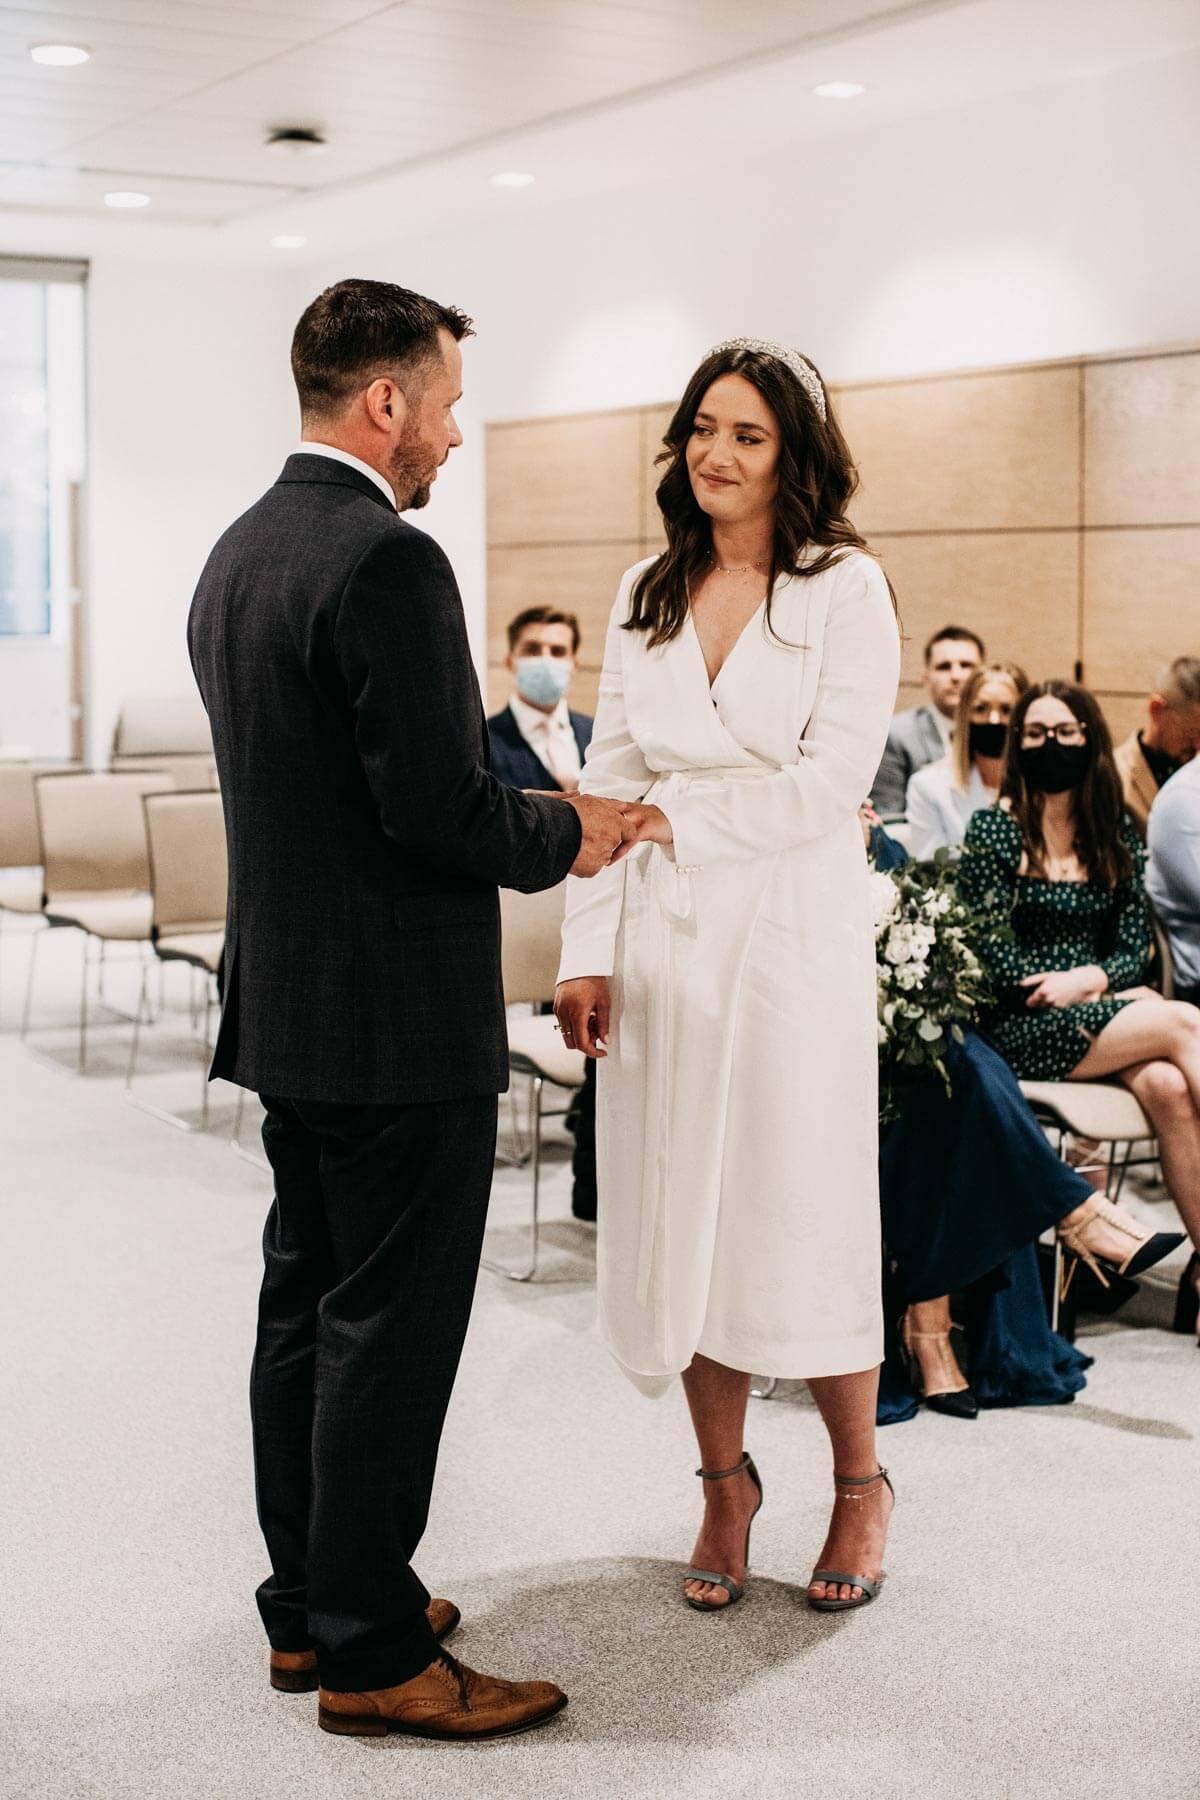 Intimate Cheshire wedding ceremony